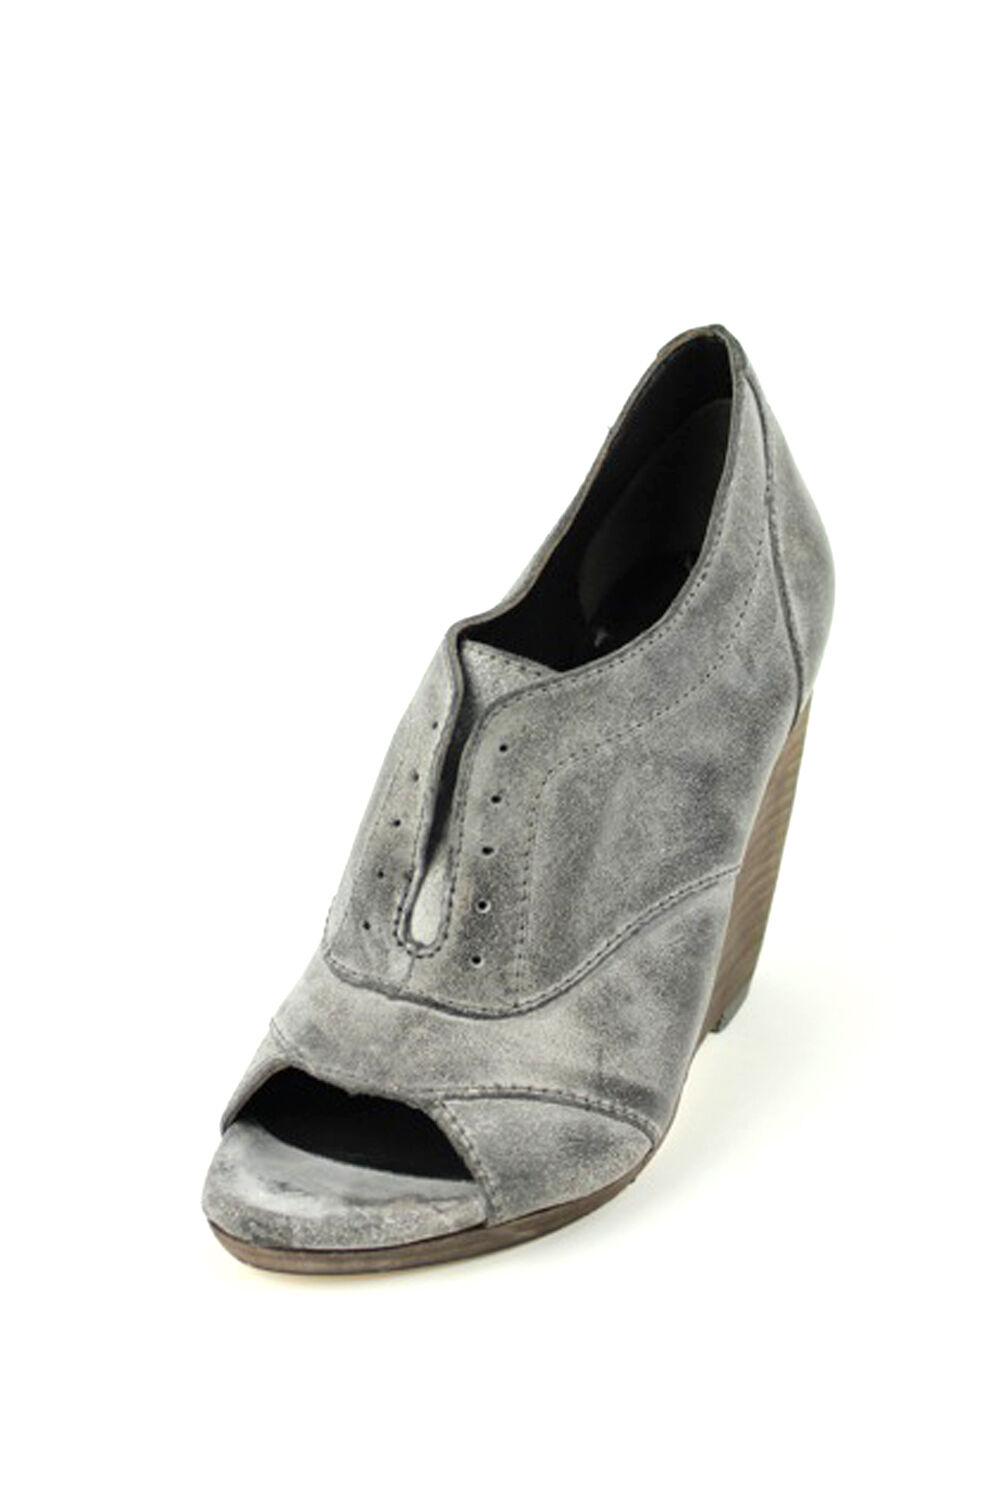 Joe's Jeans Cristy J1110 Open-Toe Pump Braun Grau 195 vintage classic Christy